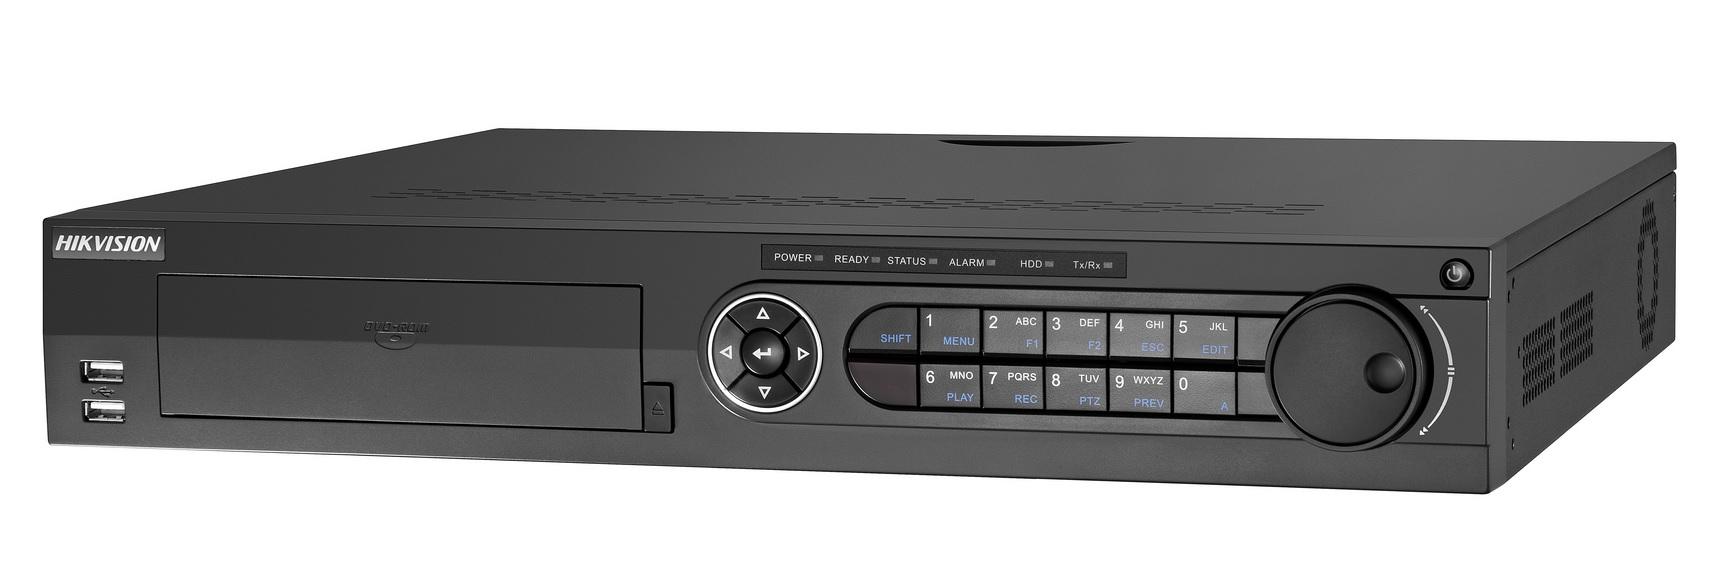 HIKVISION DS-7332HUHI-K4 Καταγραφικό HDTVI έως 8MP